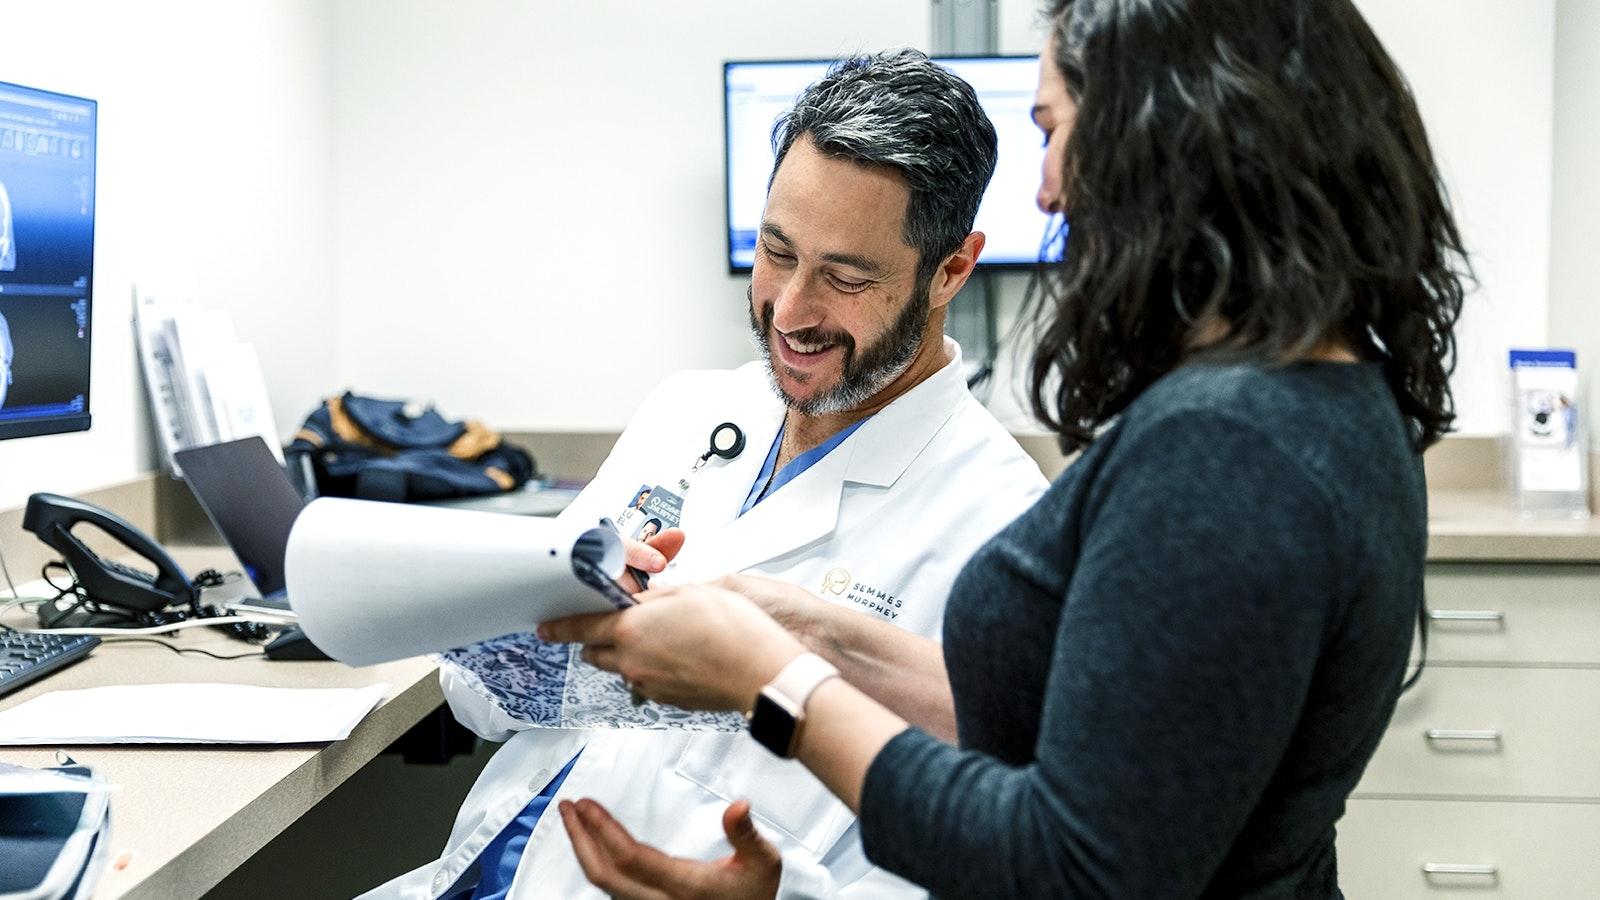 Doctor Elijovich looks over paper with nurse 0021